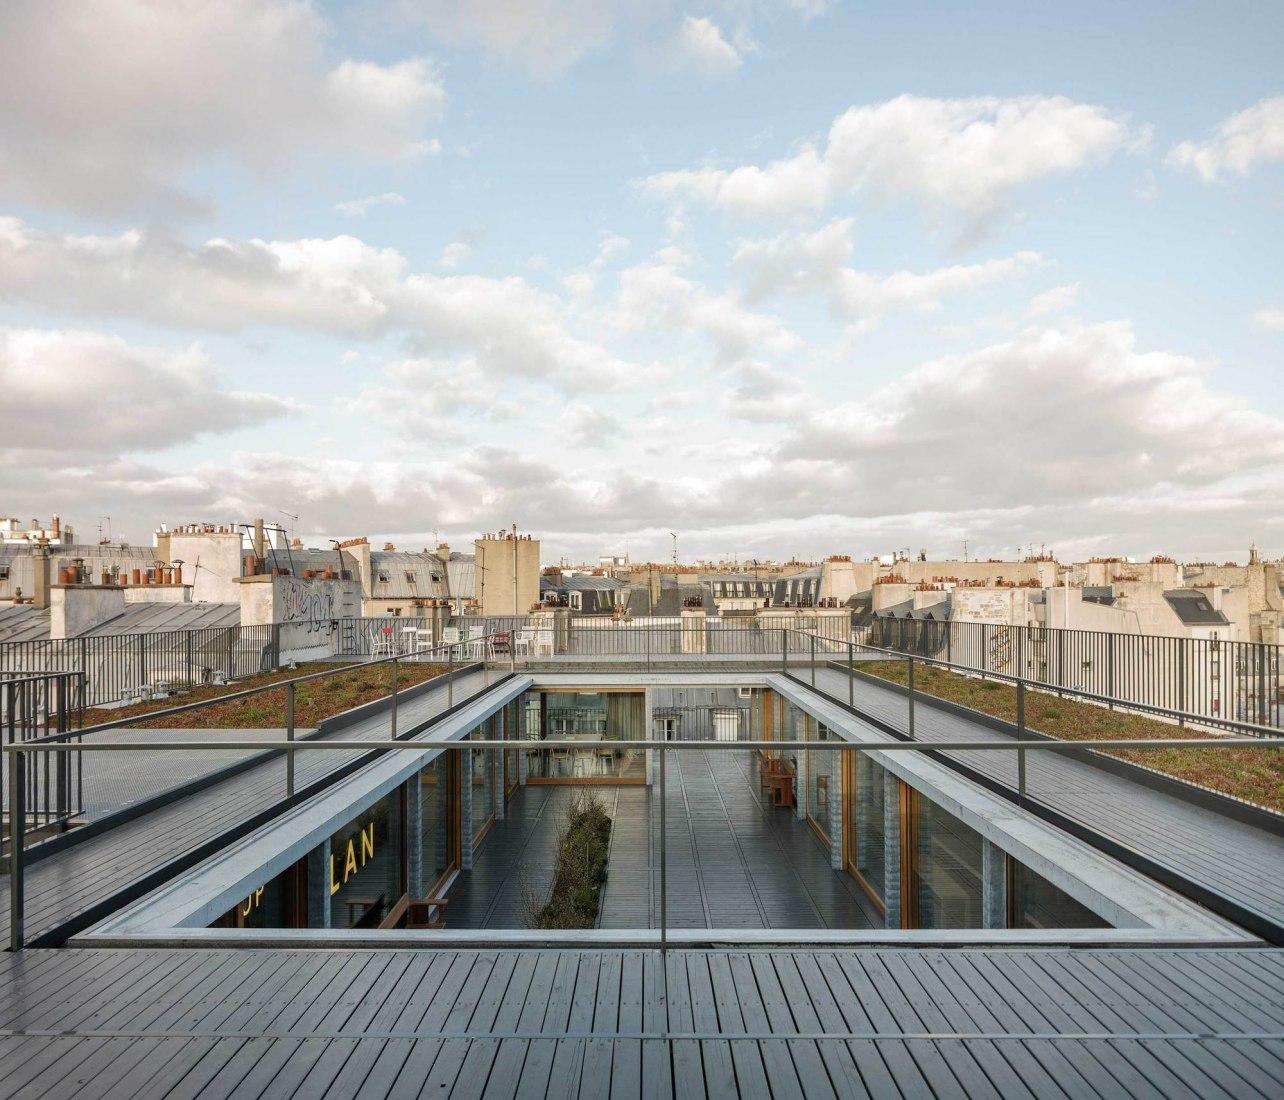 París XI office por LAN architecture. Fotografía por Cyrille Weiner